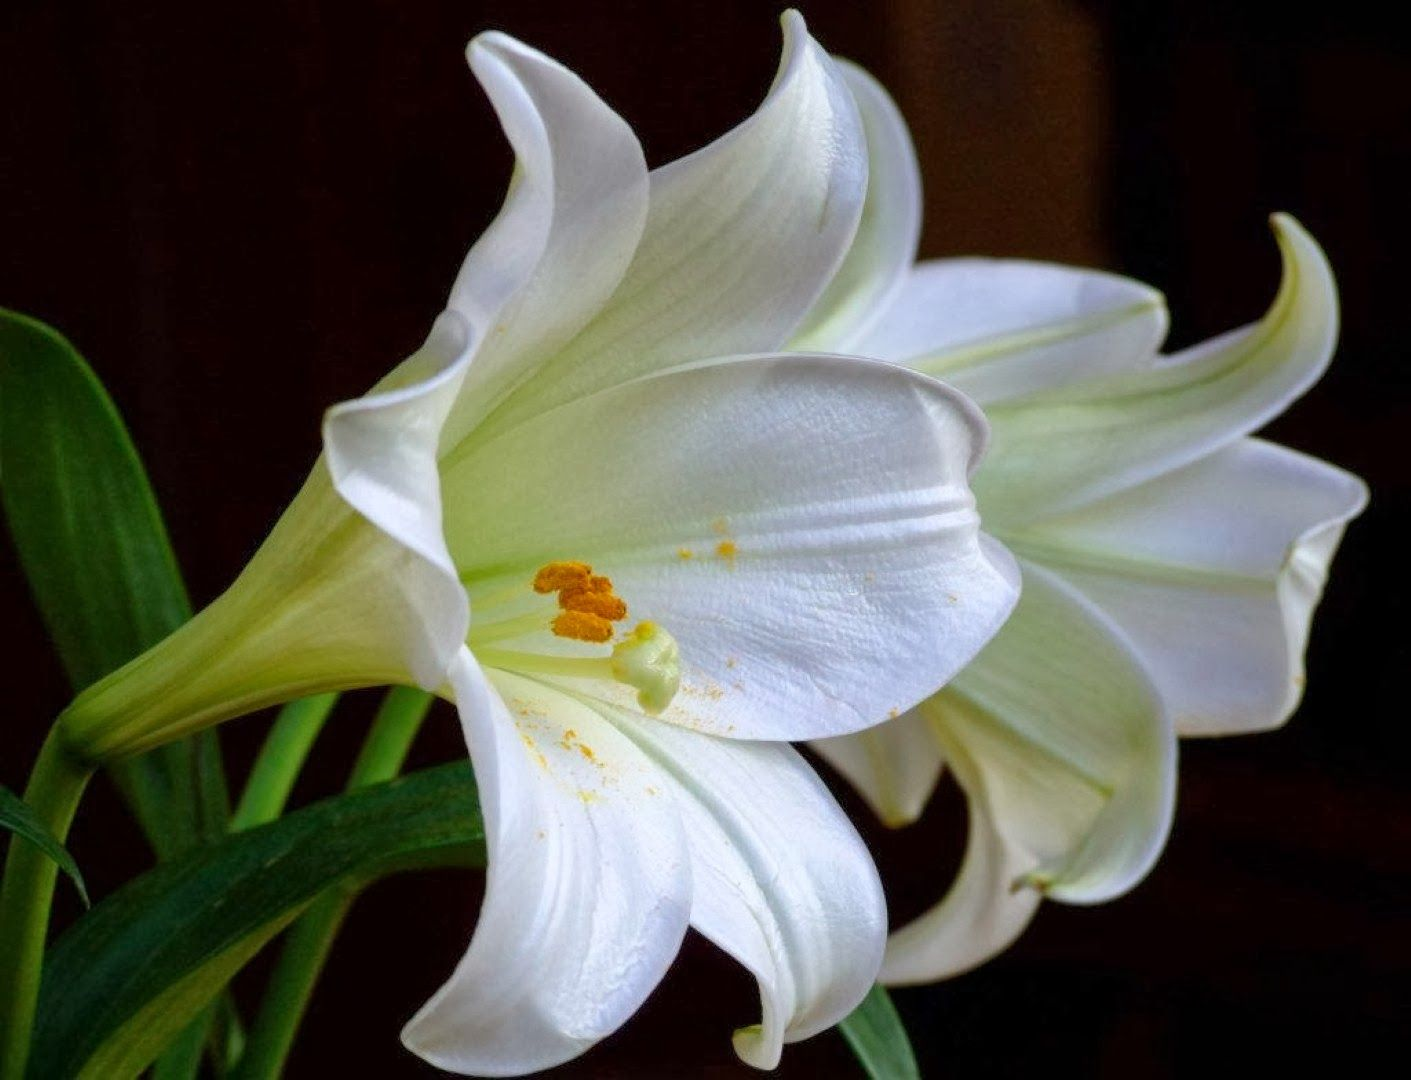 Kinds of flowers kinds of flowers pinterest flower wallpaper kinds of flowers izmirmasajfo